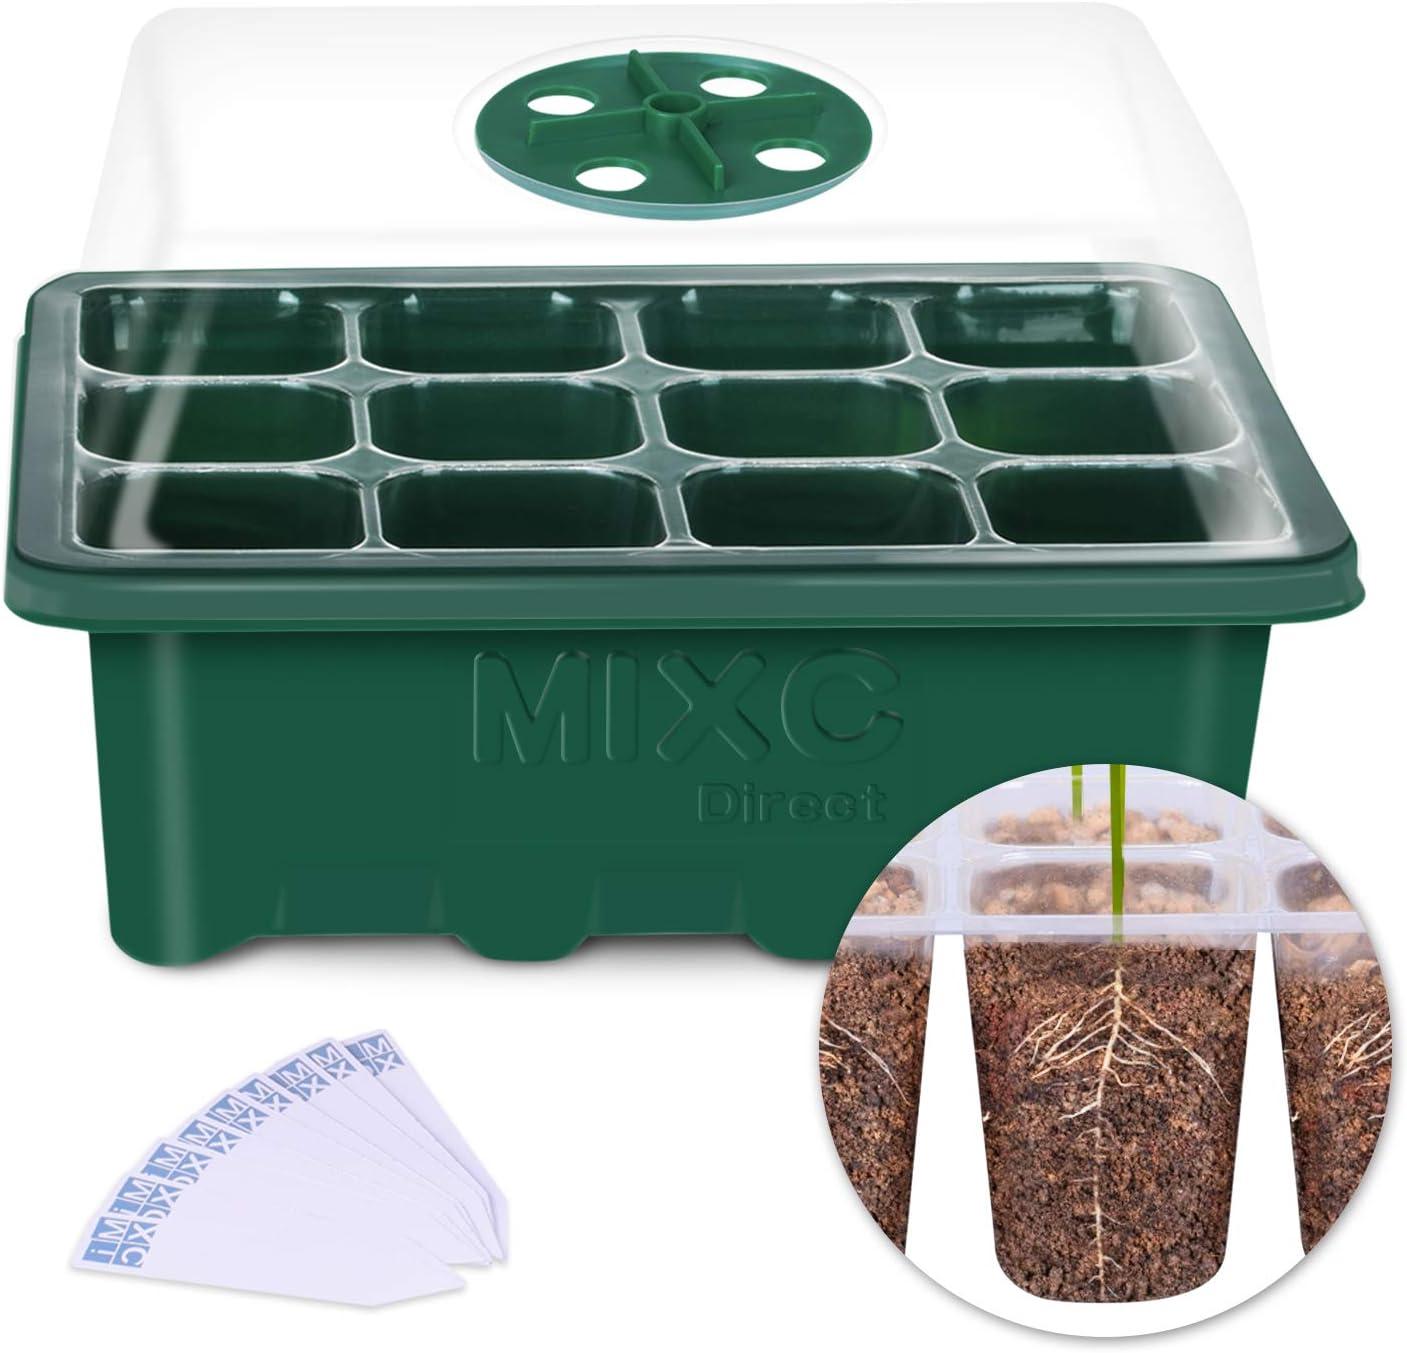 10-Pack Samen Trays Seedling Starter Tray, Mixc Humidity Adjustable Anlage Starter Kit mit Dome und Basis Greenhouse wachsen Trays Mini Propagator für Seeds Growing Starting (12 Cells Per Tray)